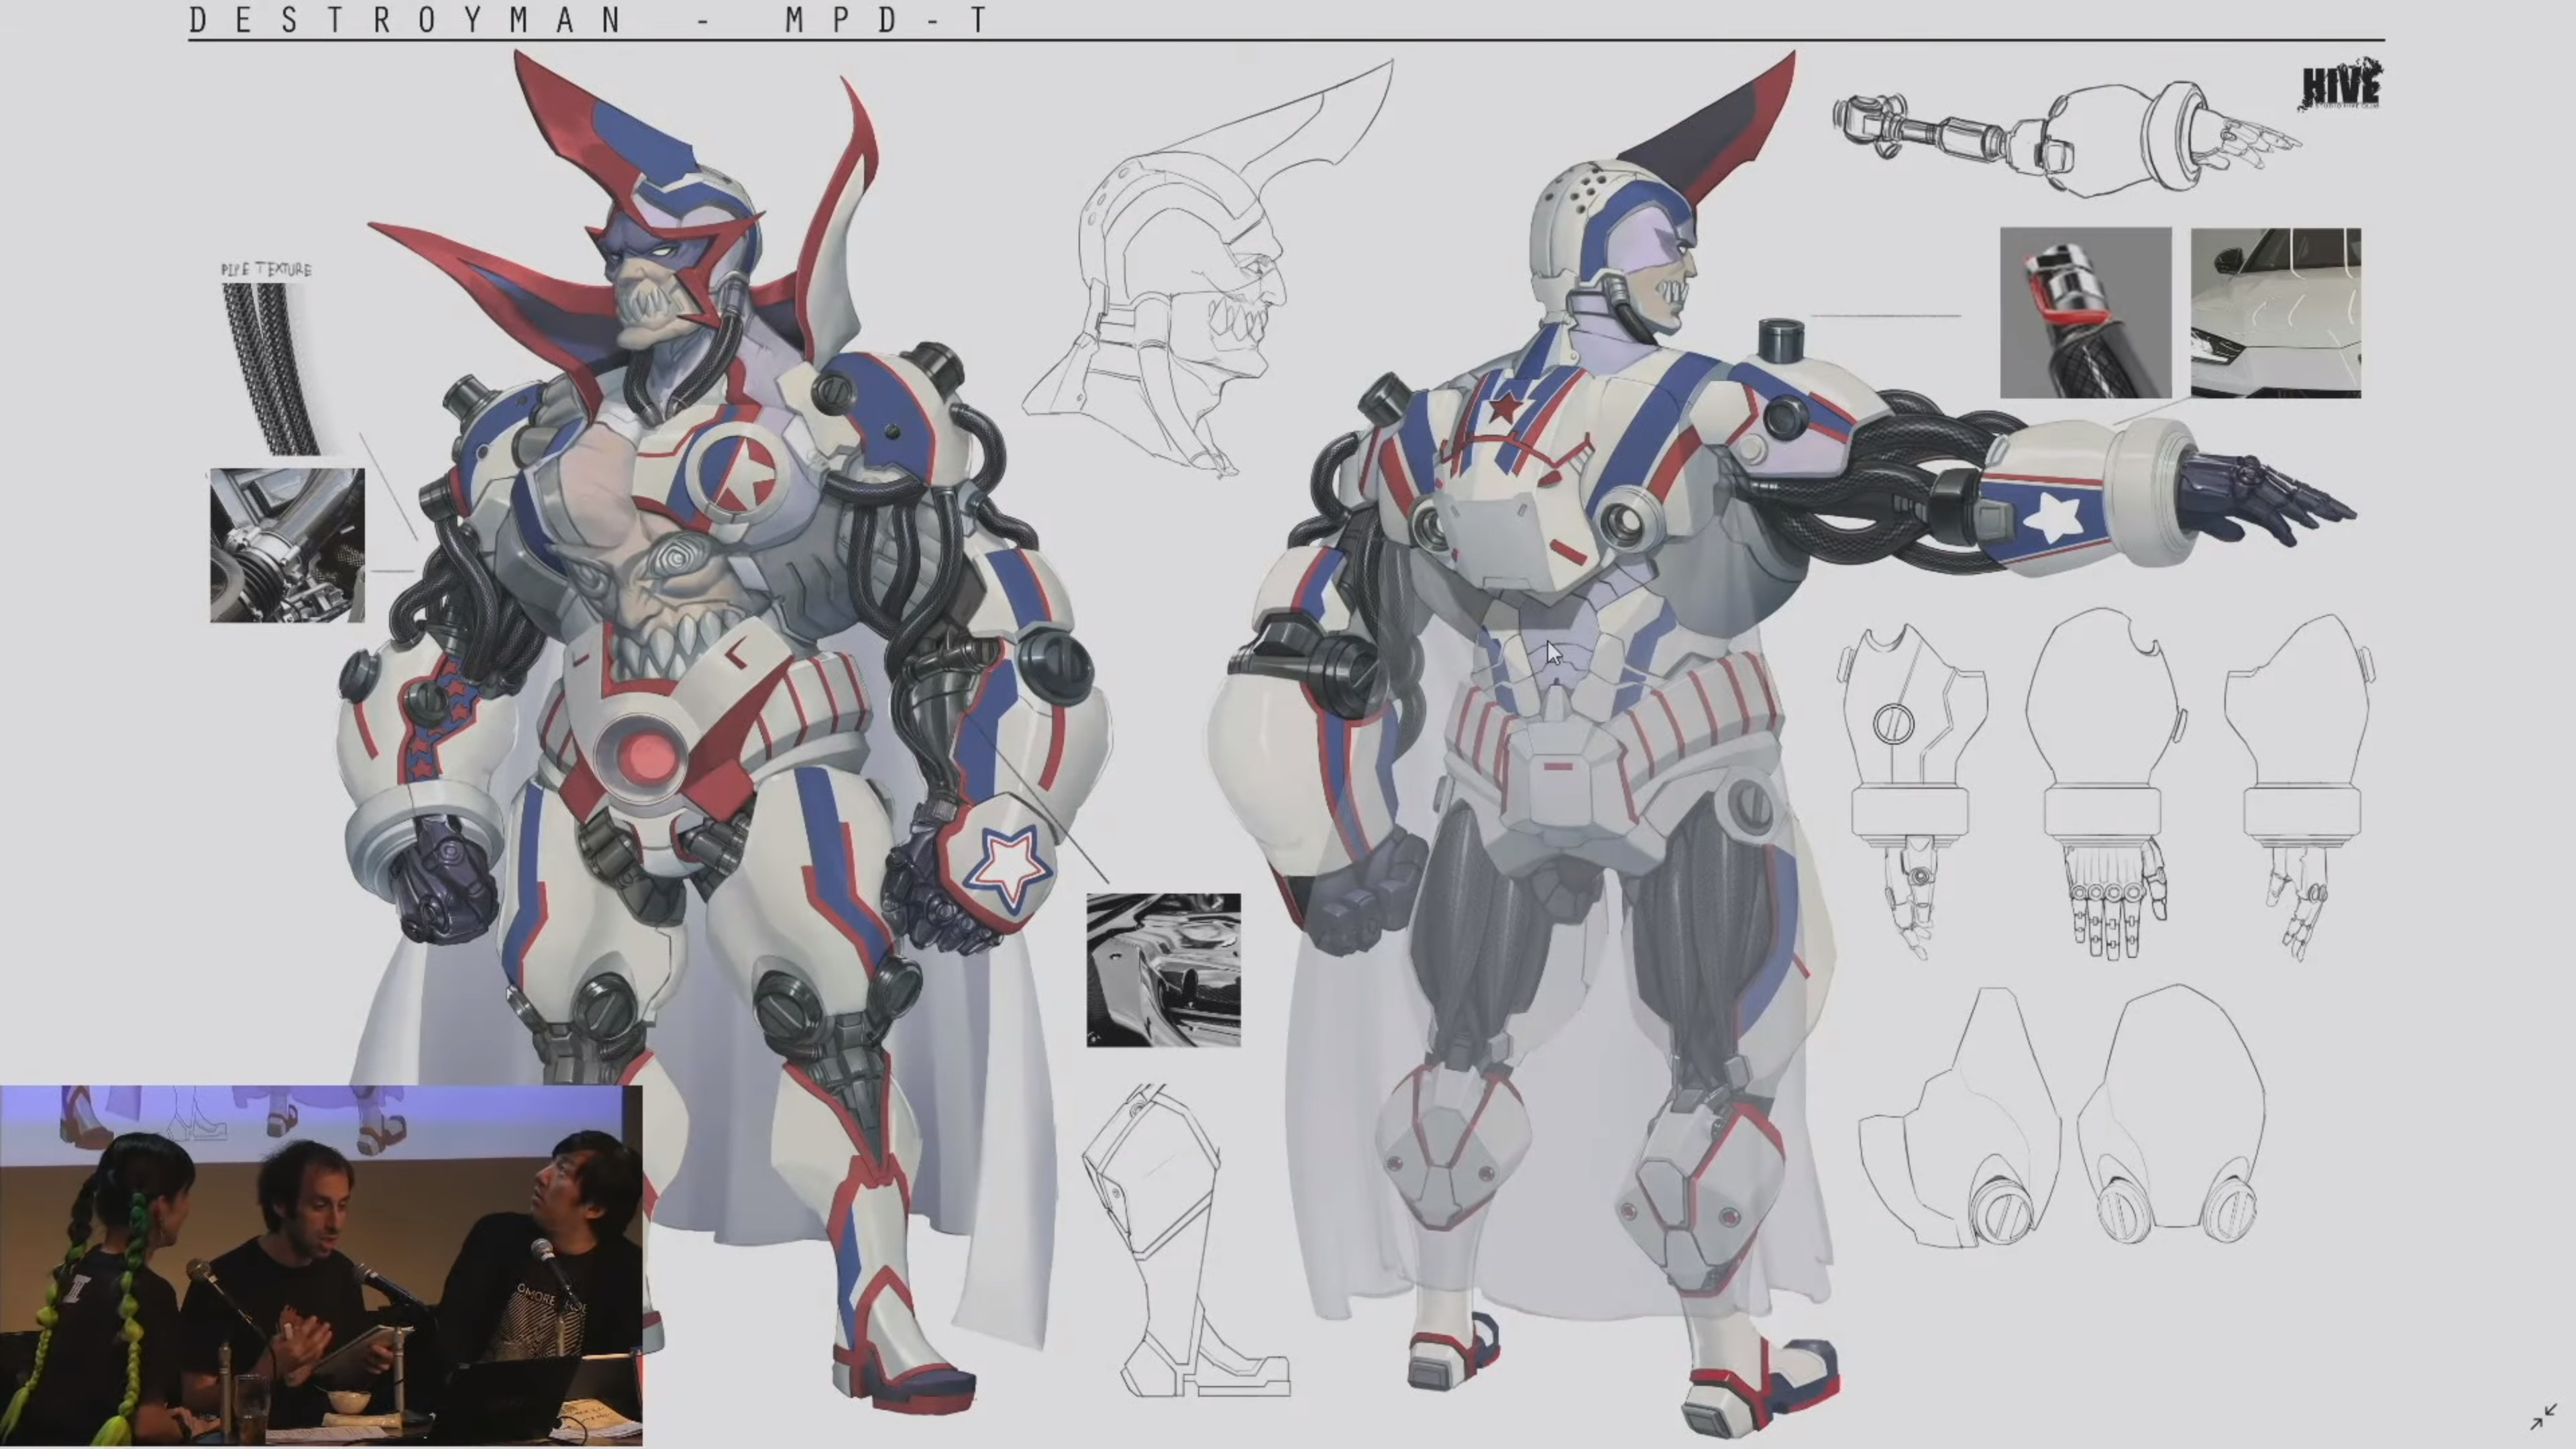 destroyman-2.jpg